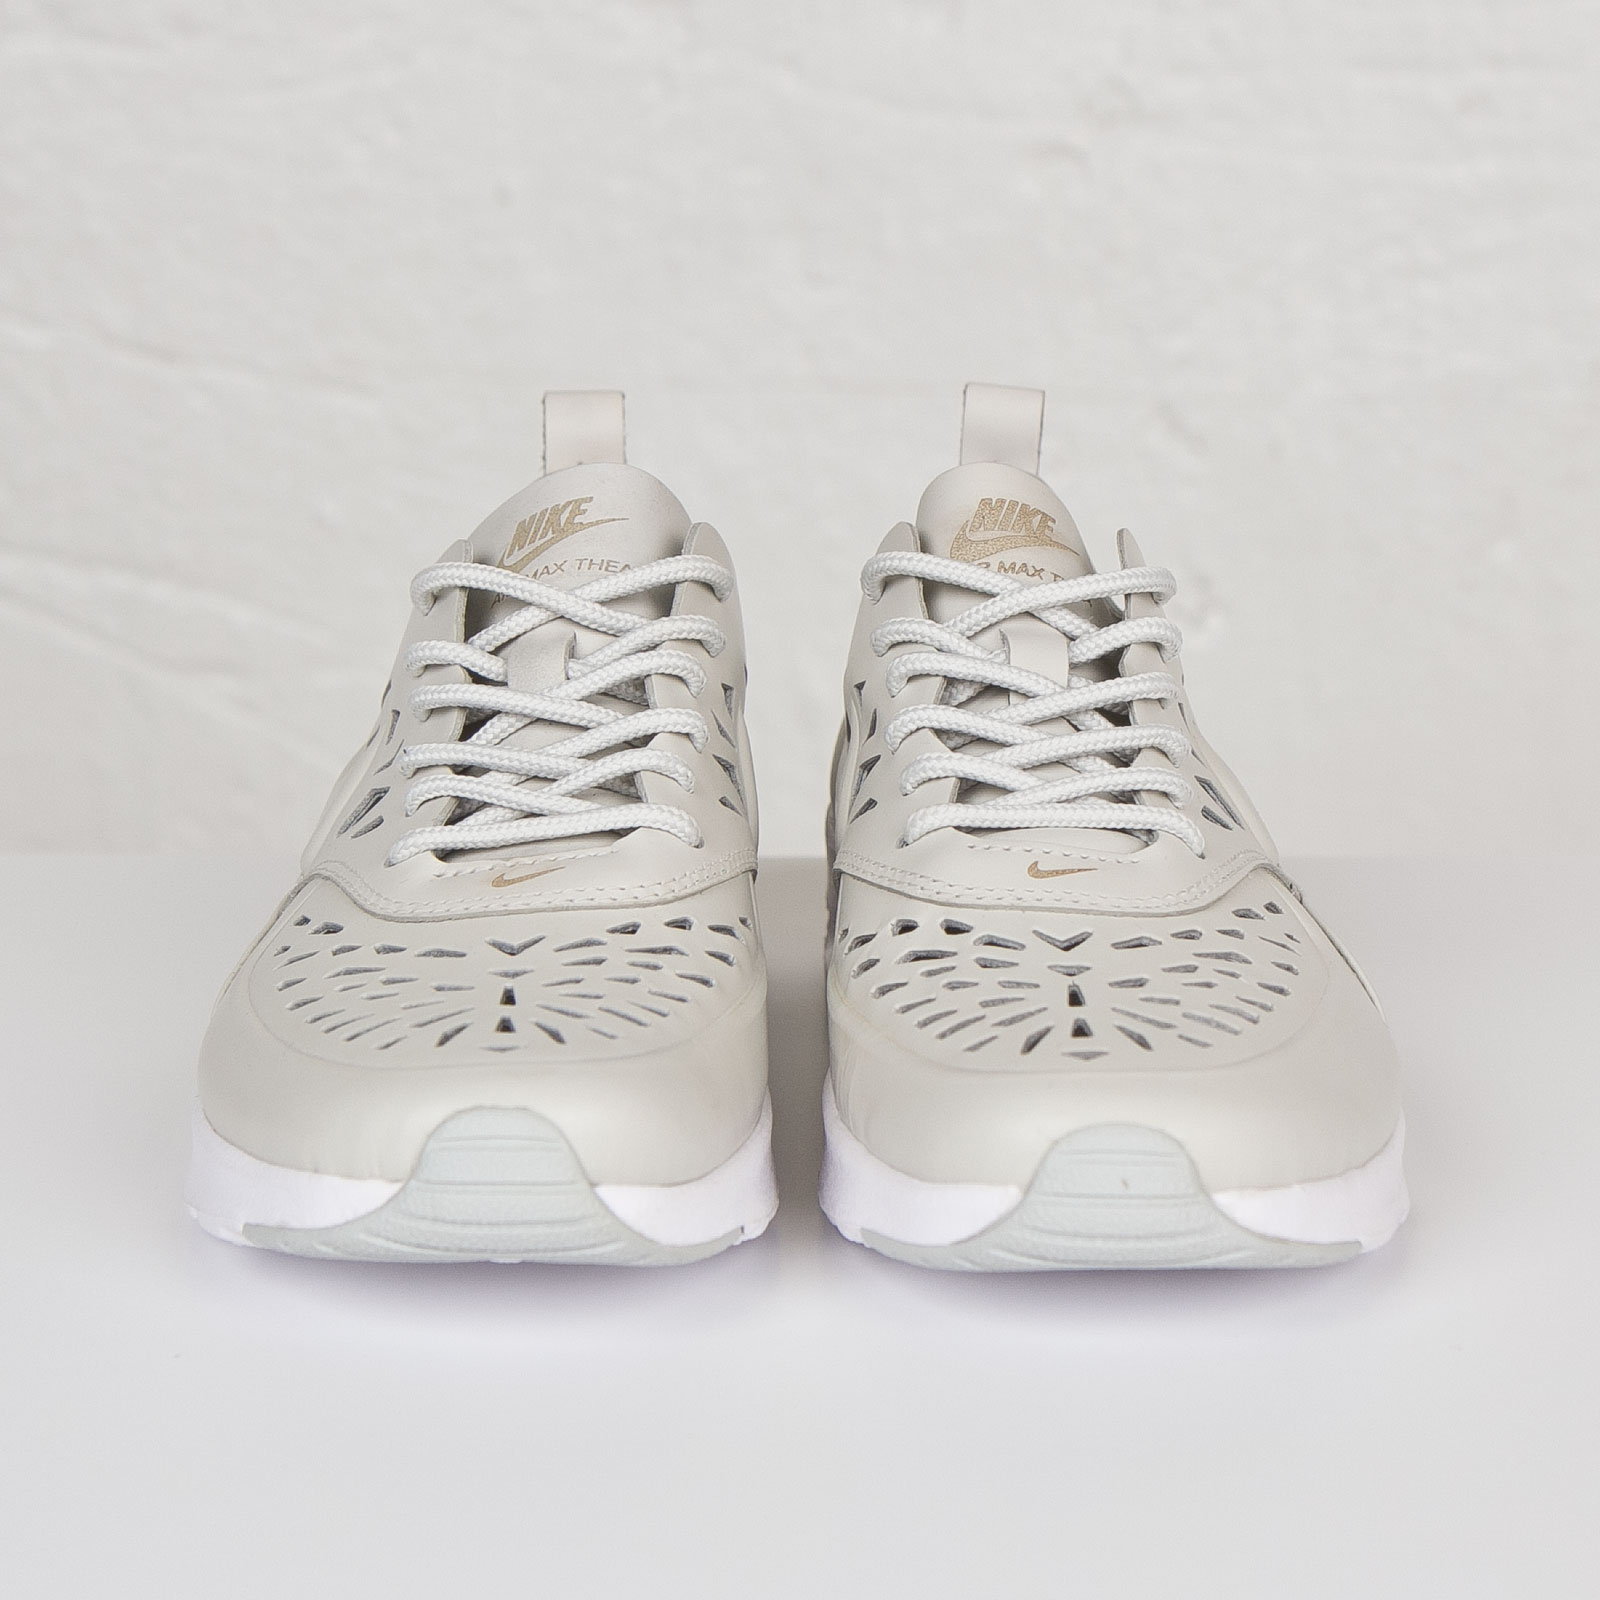 03d4ce76794f6 Nike W Air Max Thea Joli QS - 802761-001 - Sneakersnstuff | sneakers &  streetwear online since 1999